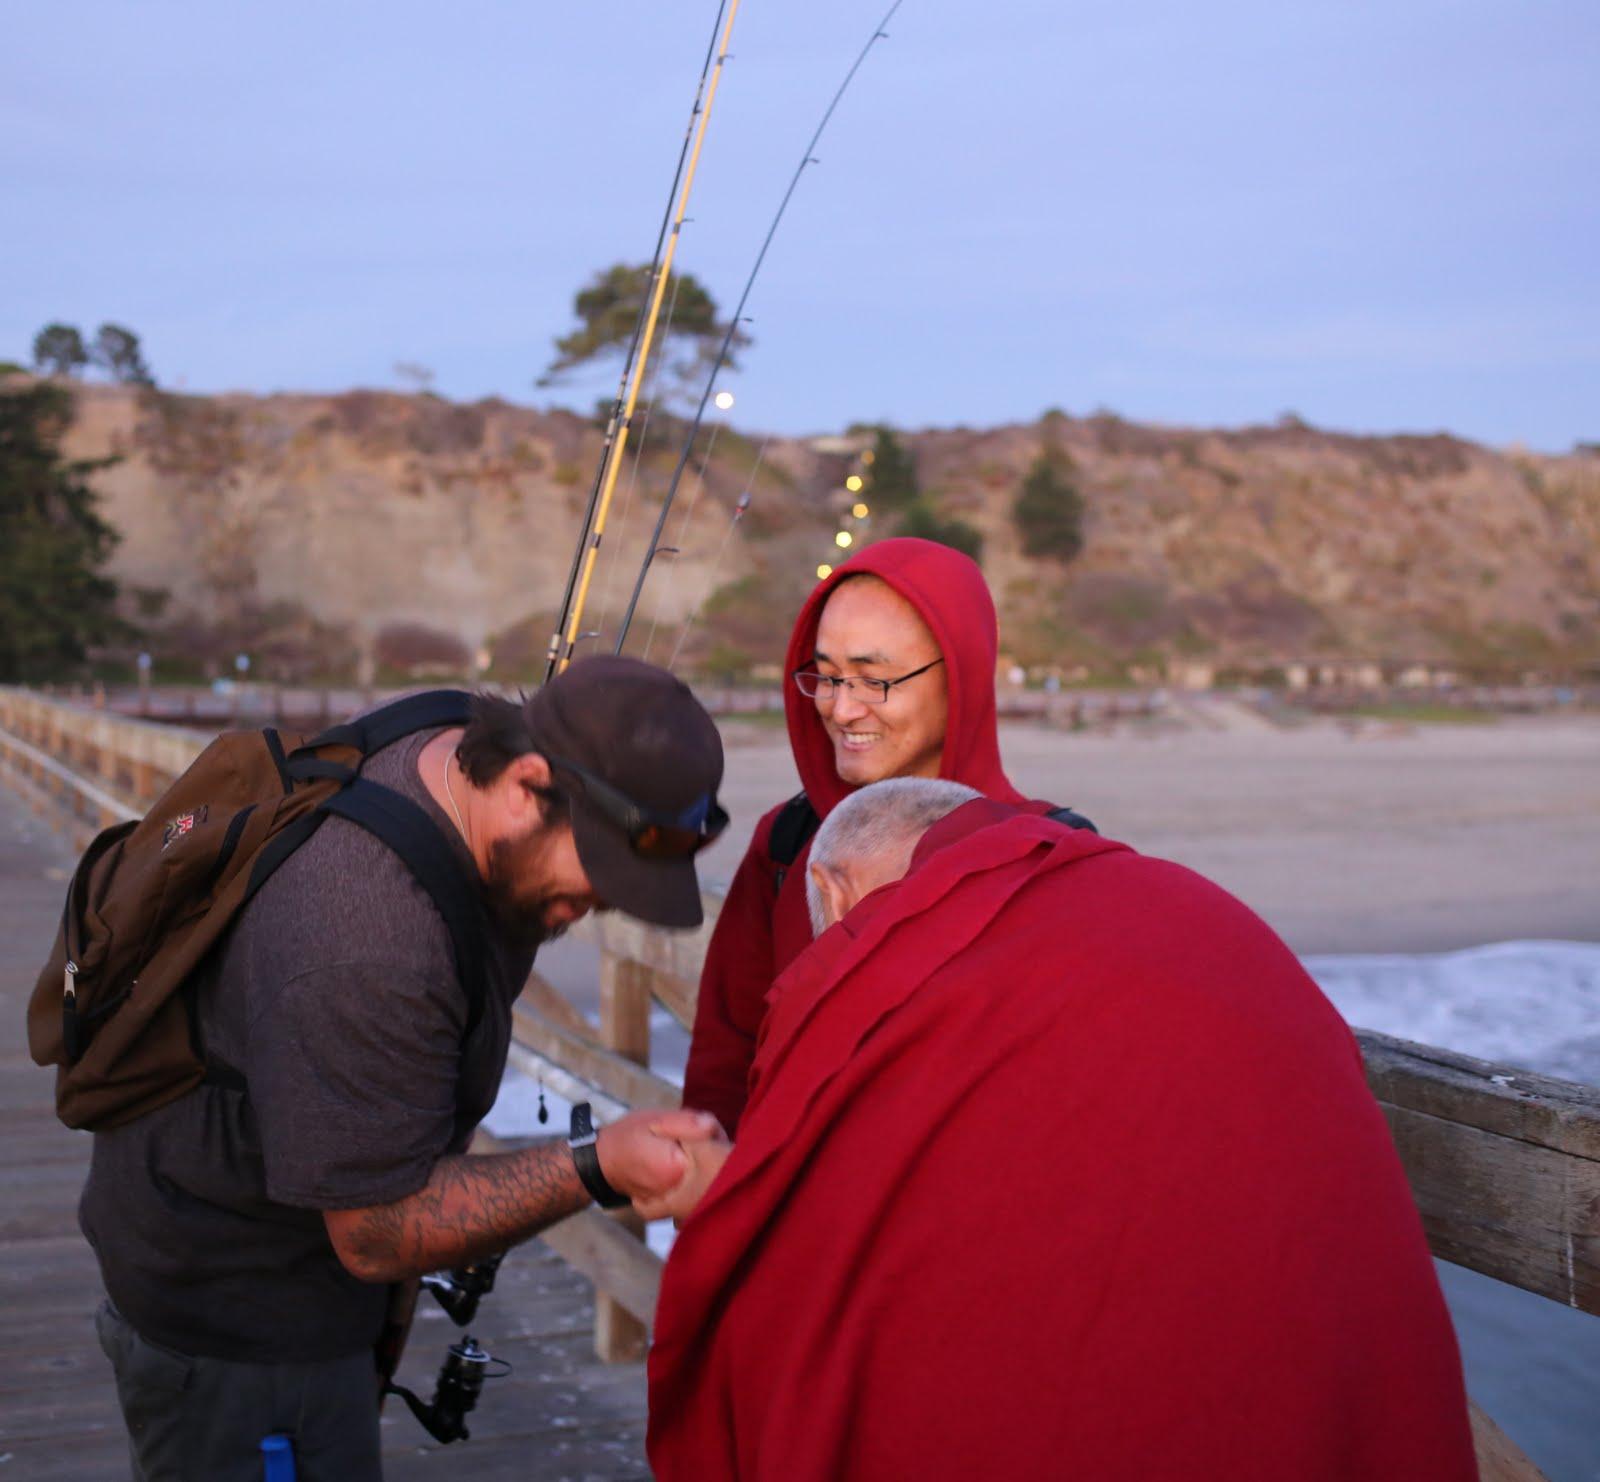 Lama Zopa Rinpoche and fisherman, California, November 2013. Photo by Ven. Thubten Kunsang.